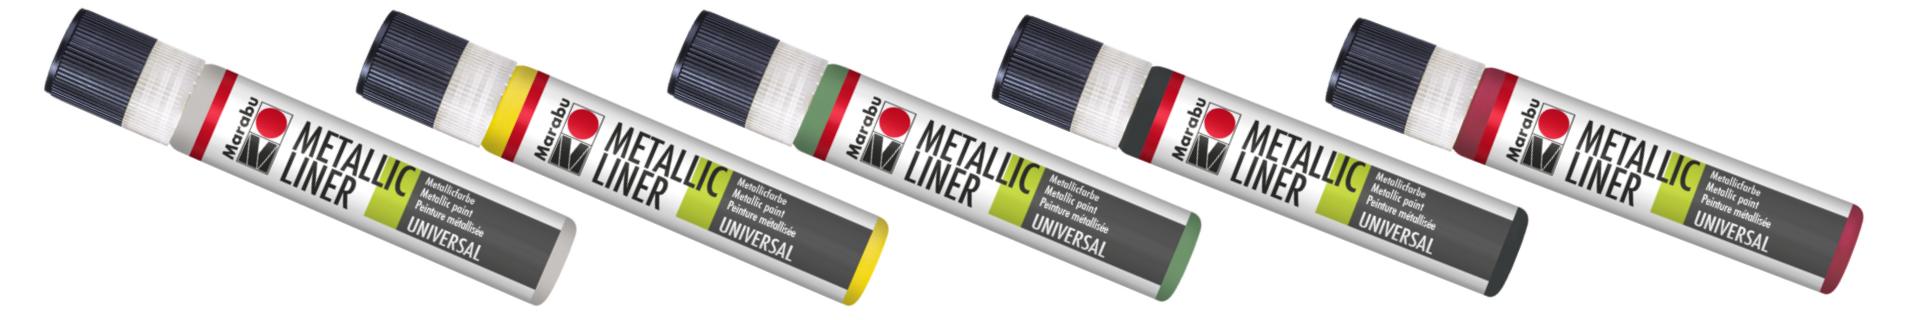 Marabu Metallic Liner